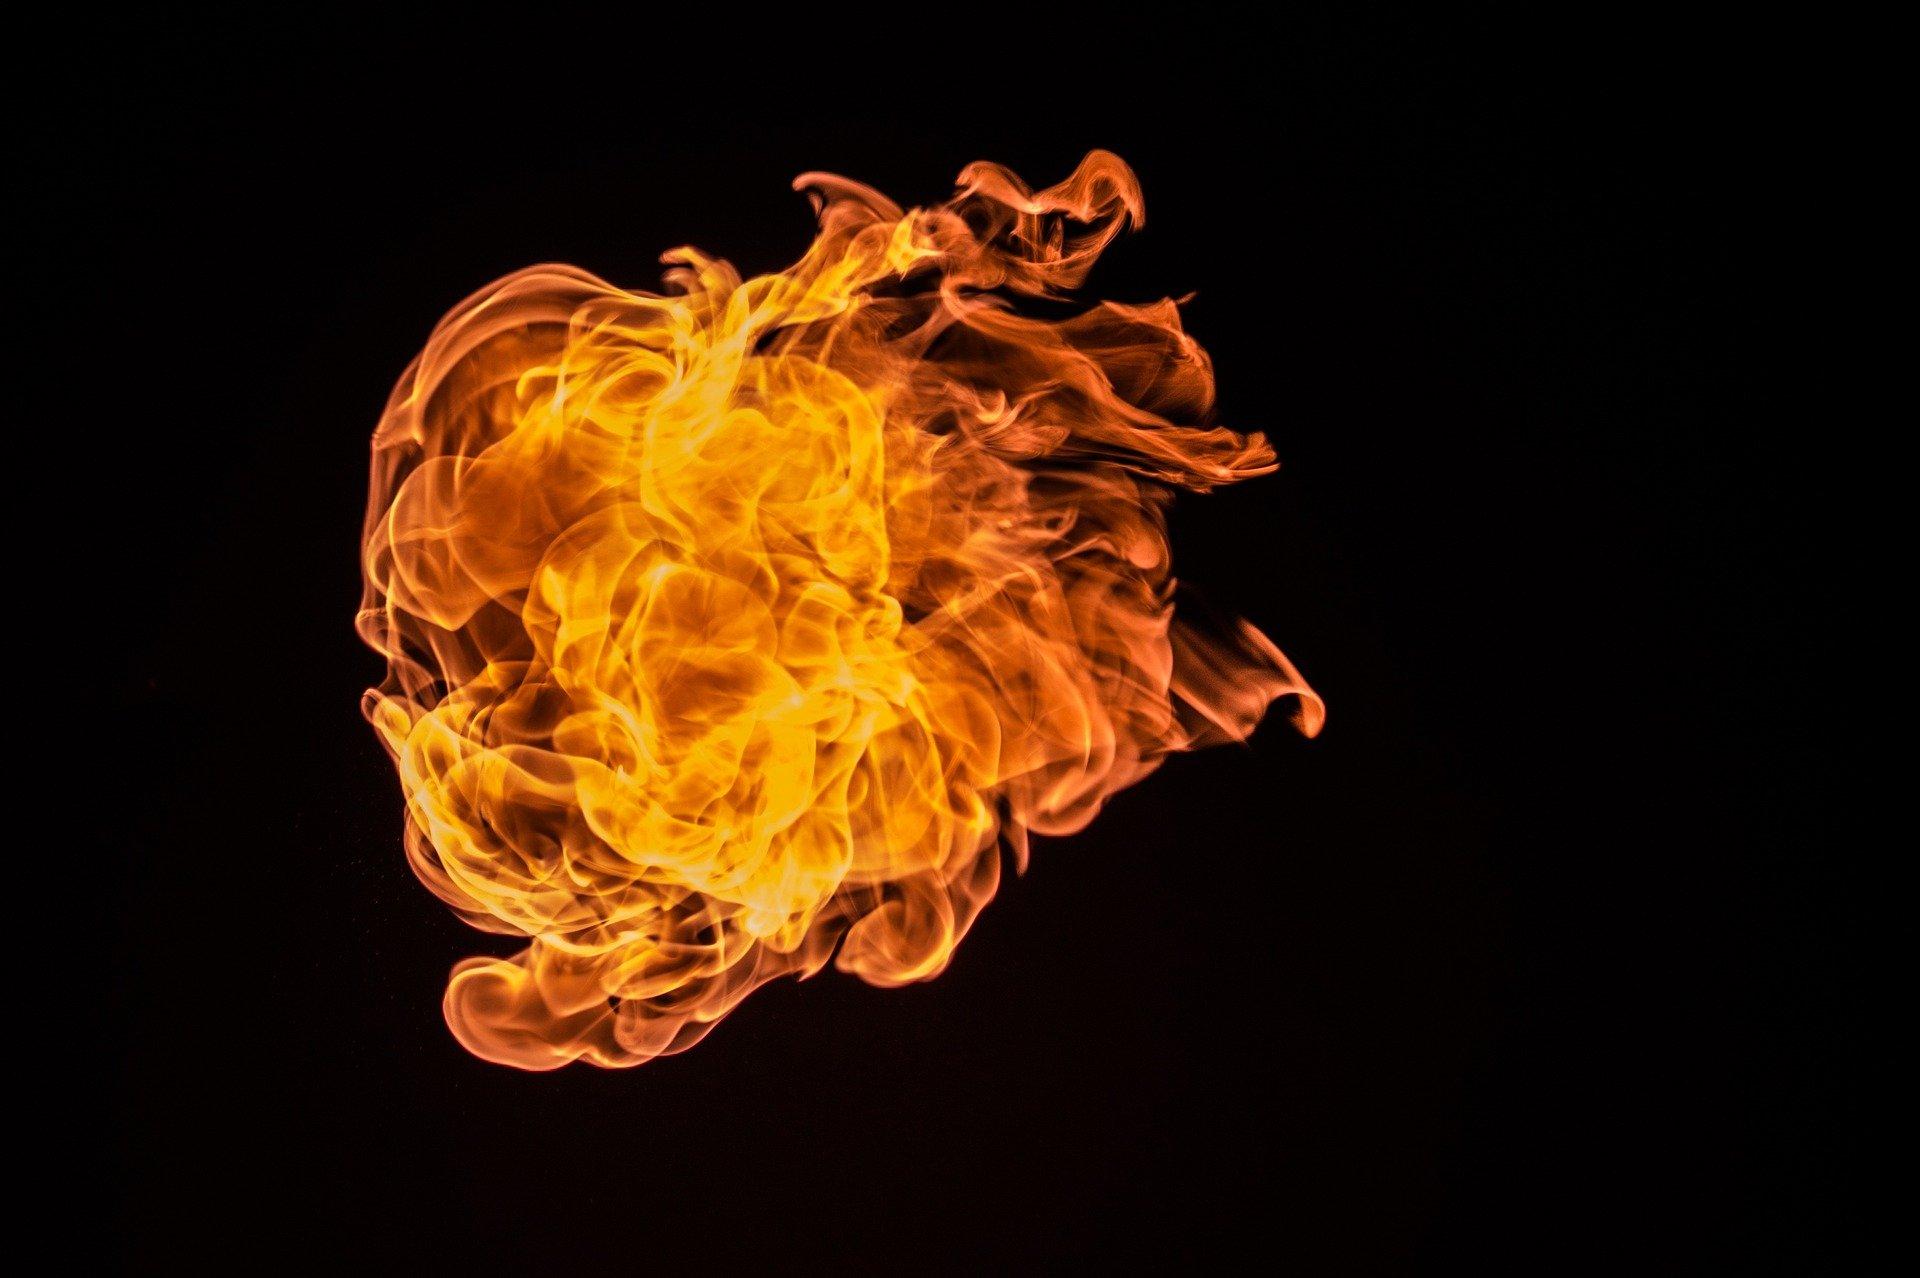 Hypocrisy extinguishes the flames of God